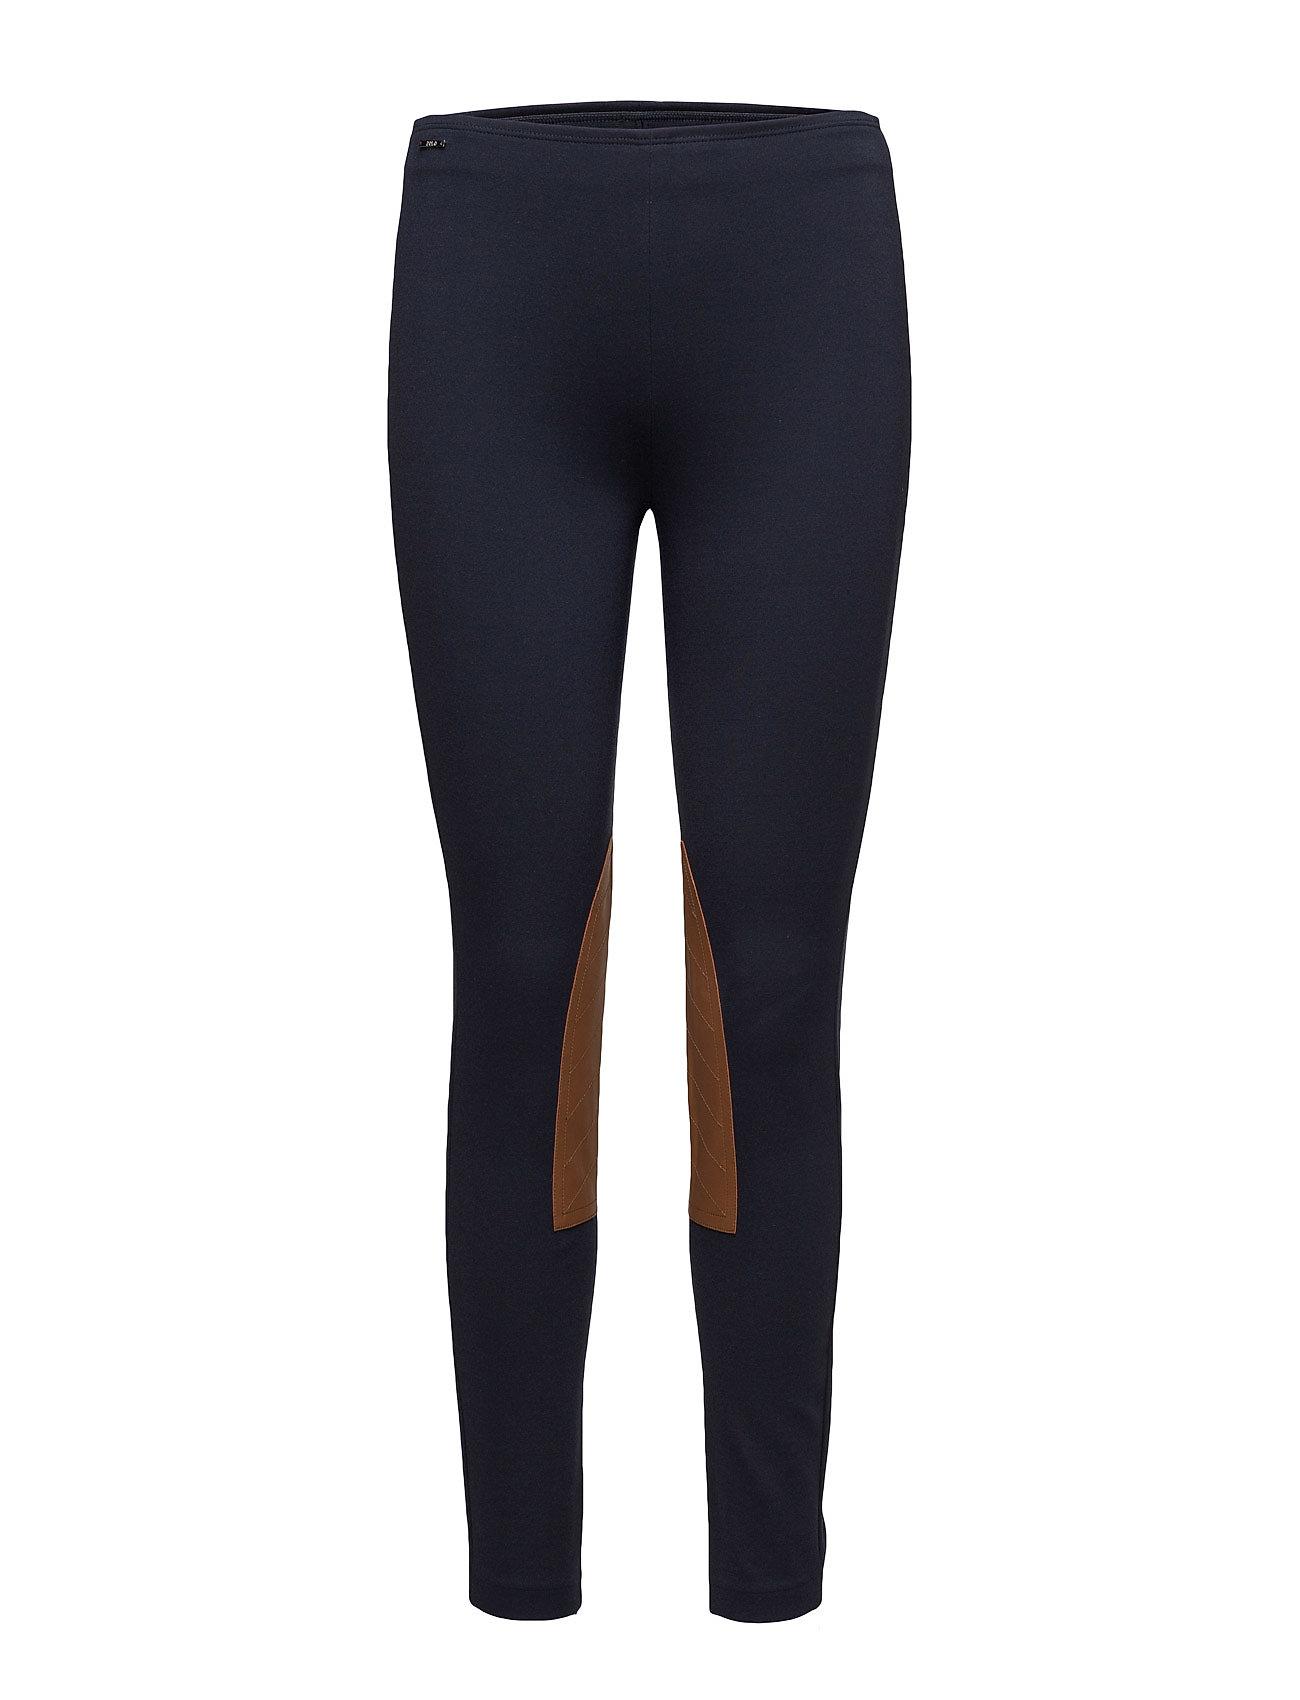 Polo Ralph Lauren Jodhpur Stretch Skinny Pant - AVIATOR NAVY